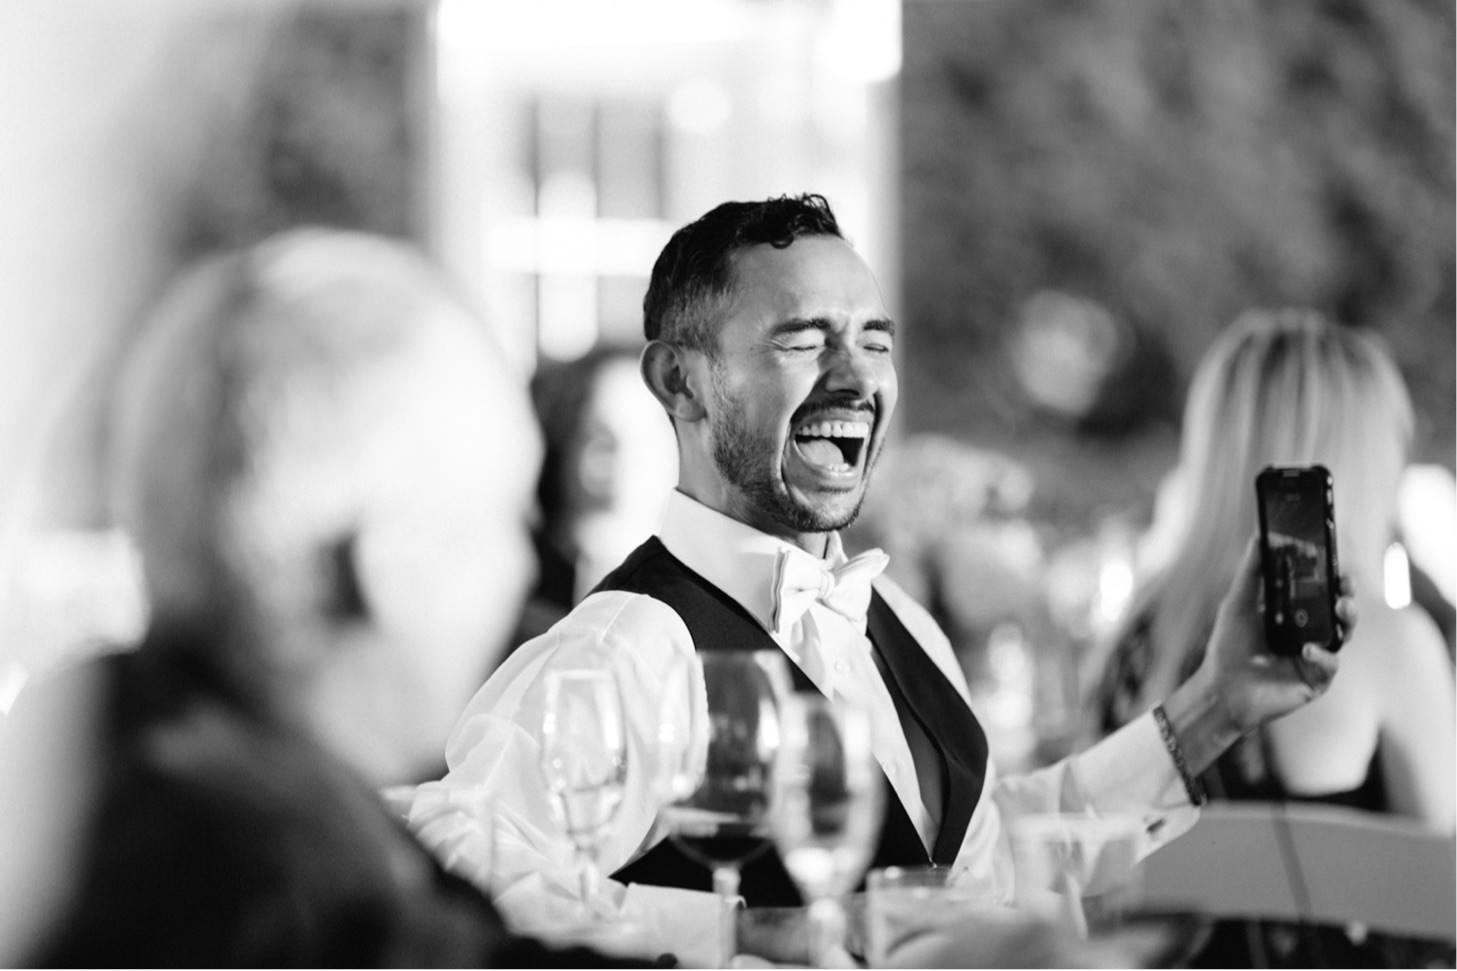 ritz-charles-wedding-reception-downtown-indianapolis-wedding-photographer044.JPG